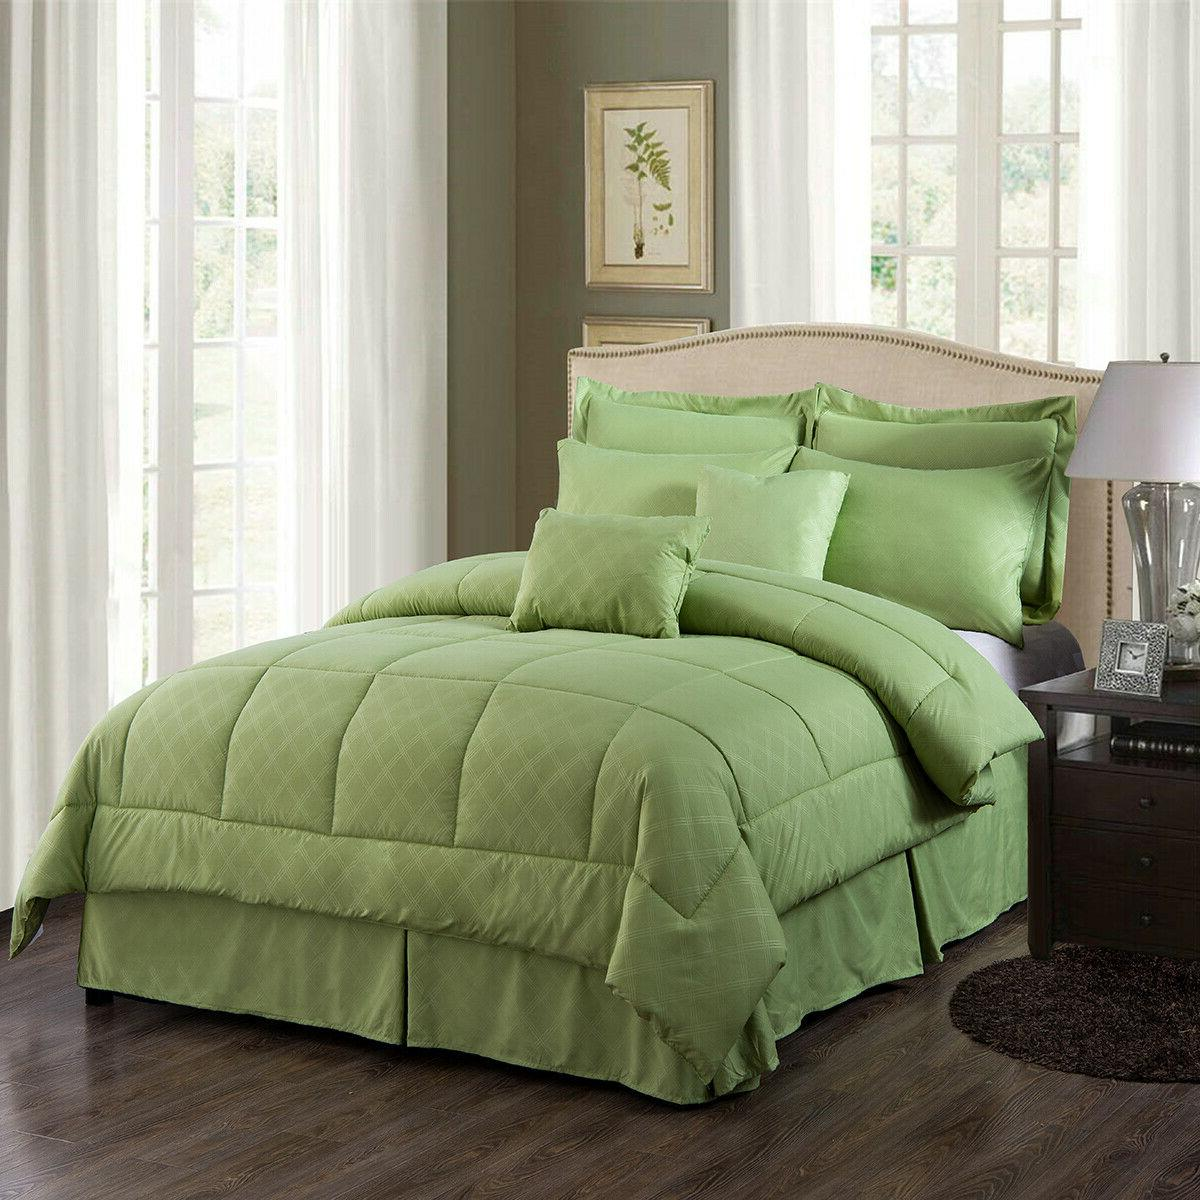 10-Piece Bedding Bed